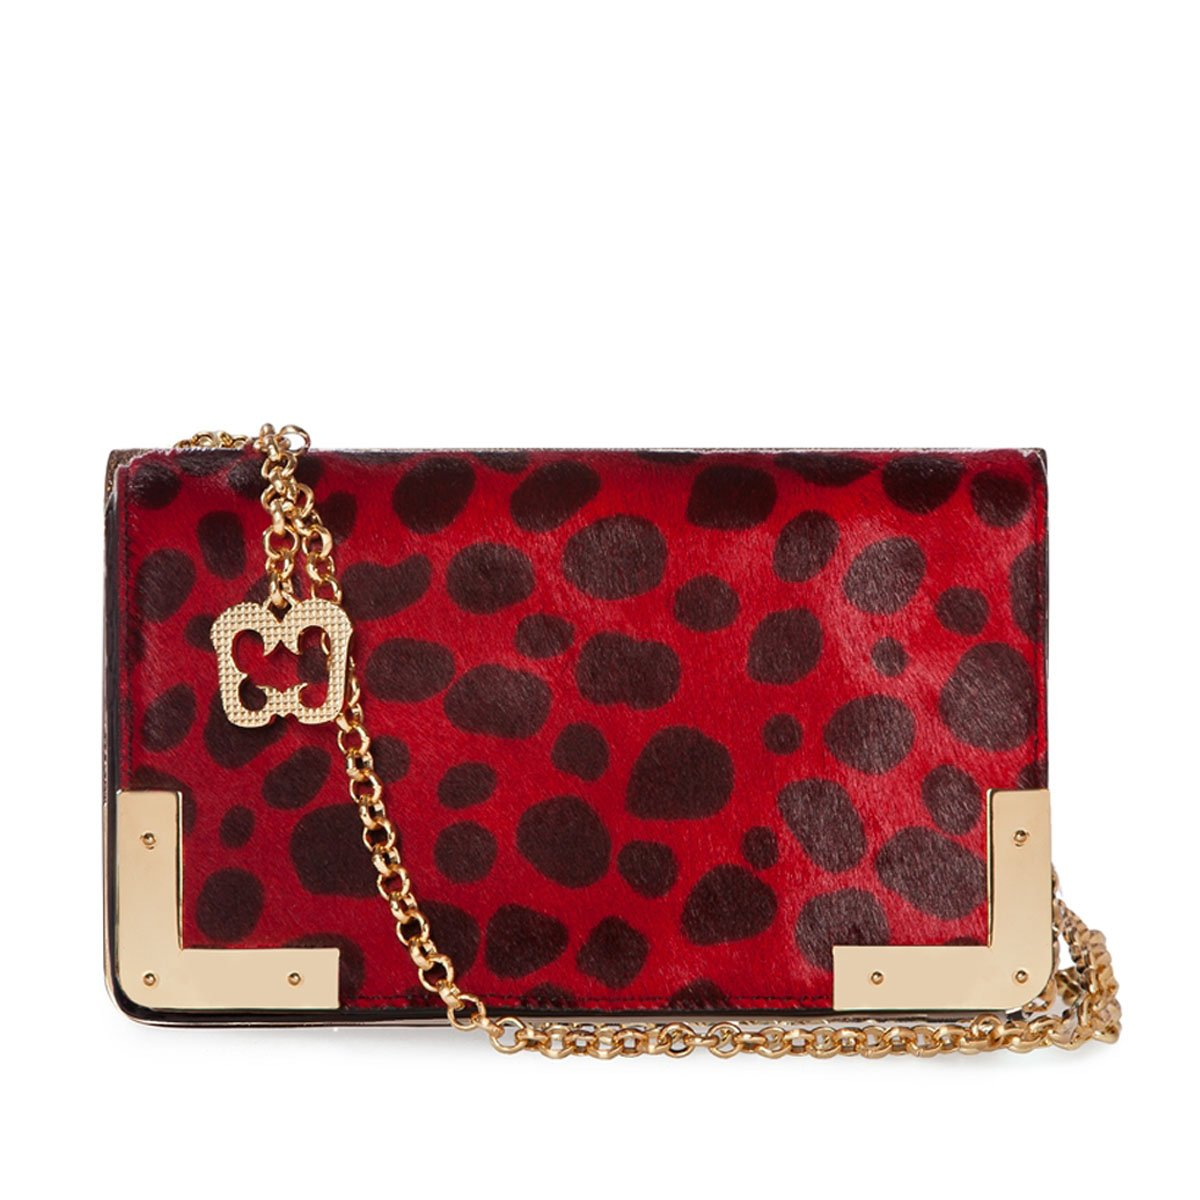 Cassidy Eric Javits Luxury Fashion Designer Womens Handbag Red Black